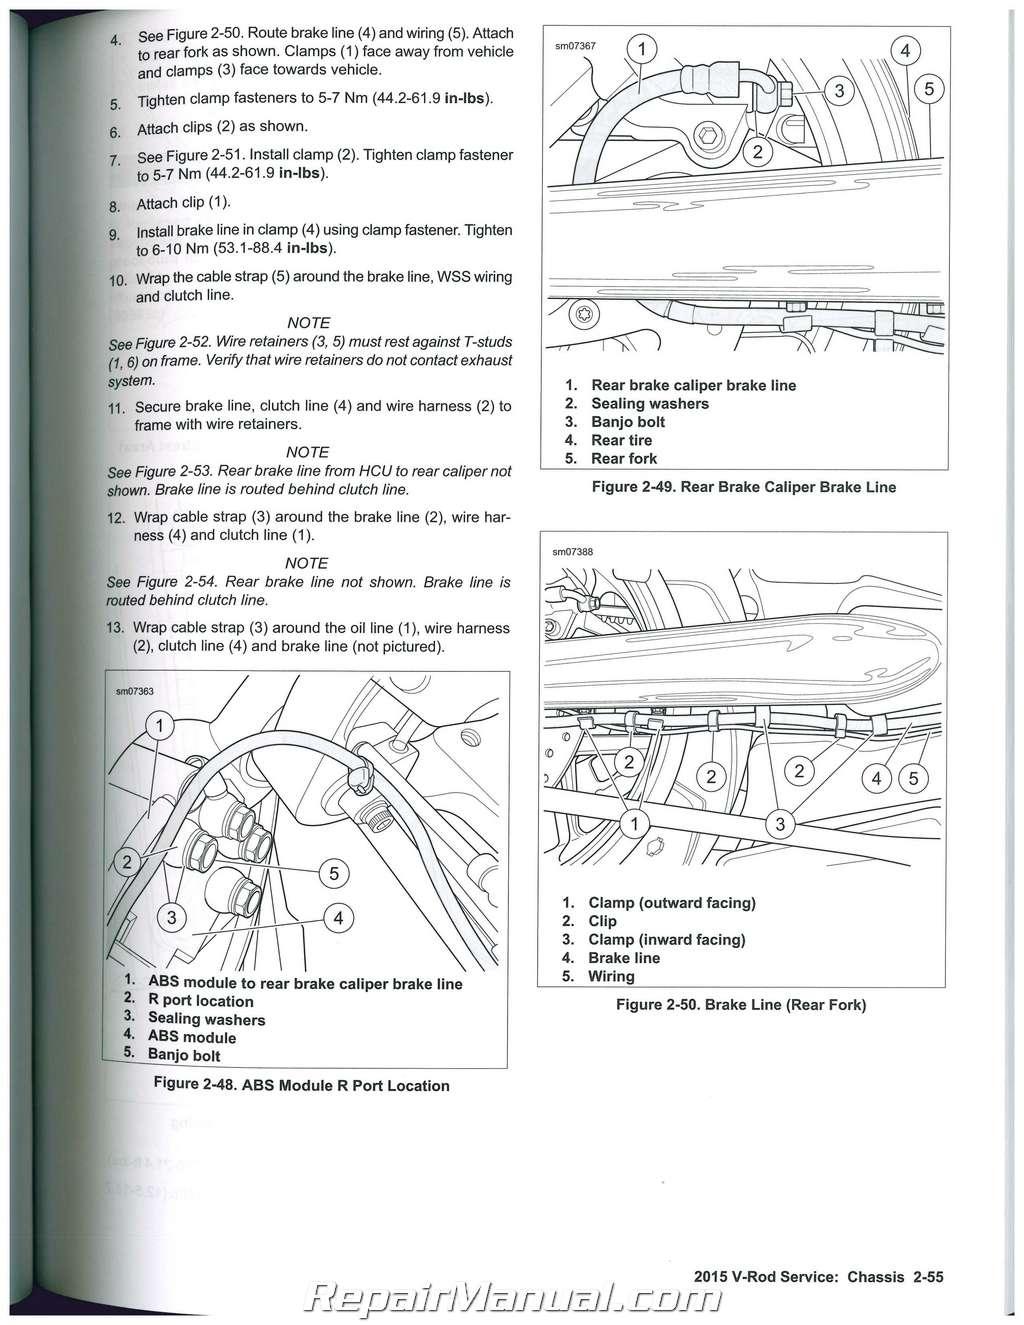 2015 harley davidson v rod motorcycle service manual rh repairmanual com harley davidson v rod service manual free harley davidson 2009 v rod service repair manual.pdf